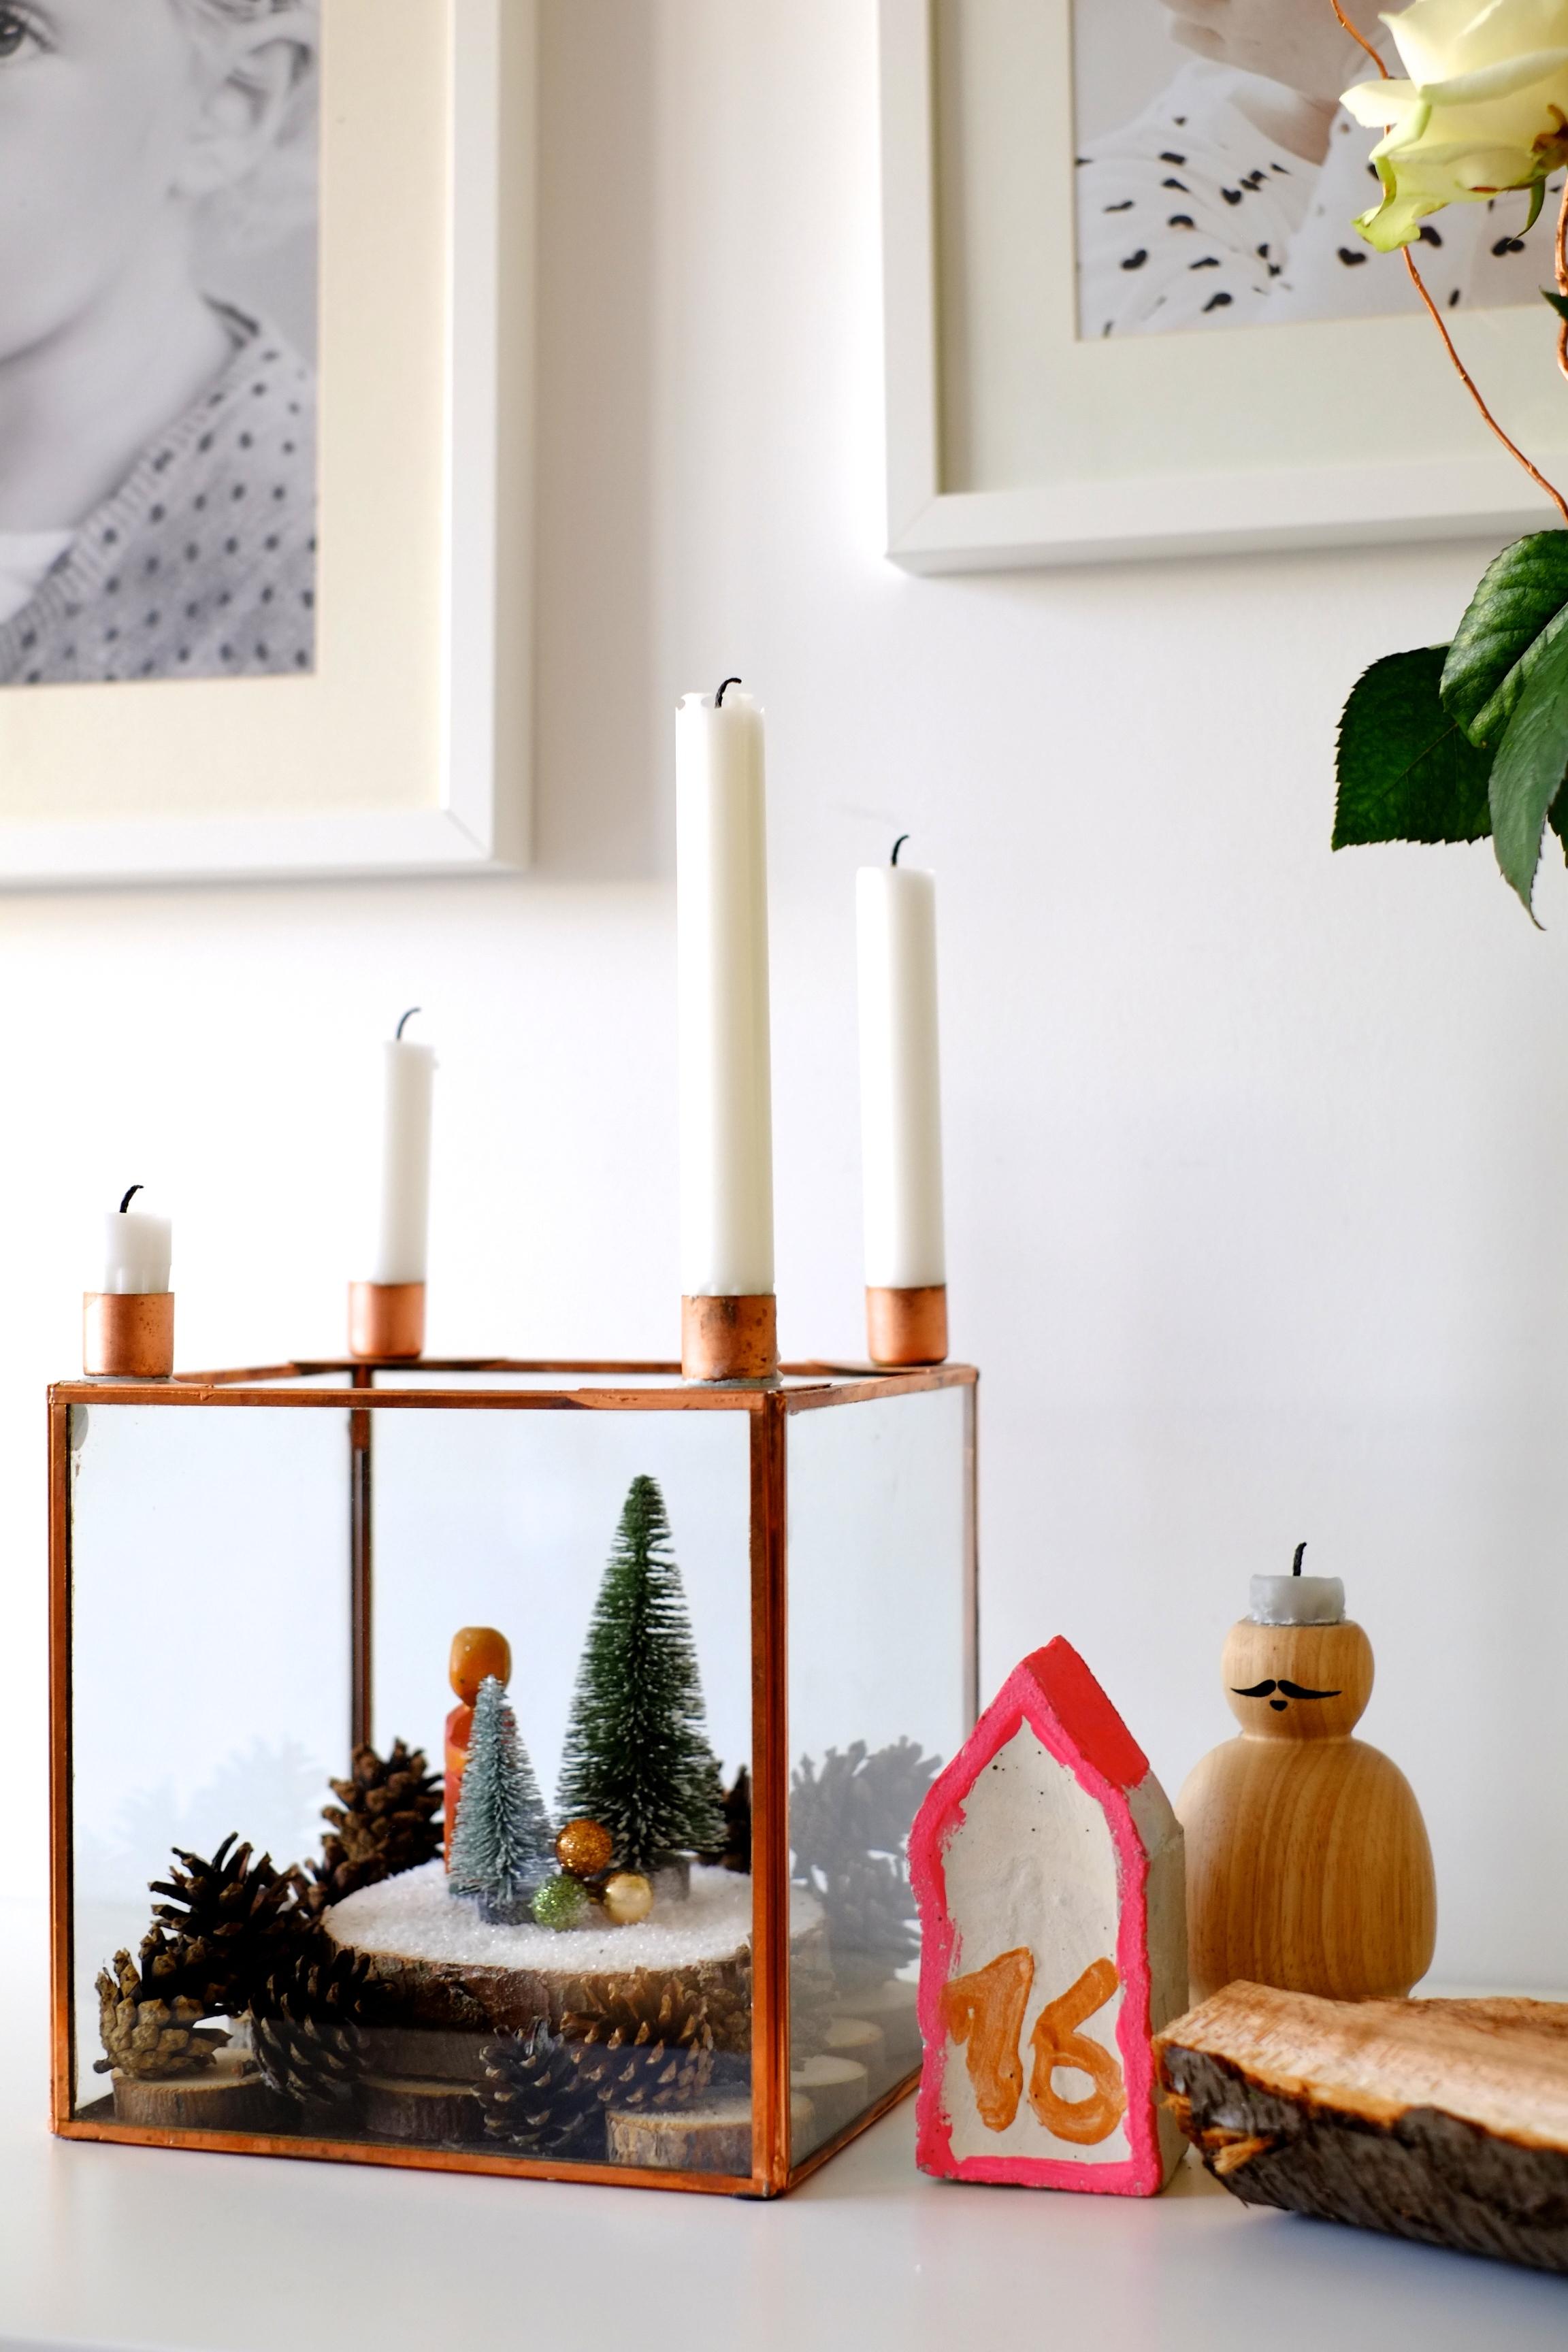 5 dinge im november herr und frau krauss shop und blog. Black Bedroom Furniture Sets. Home Design Ideas